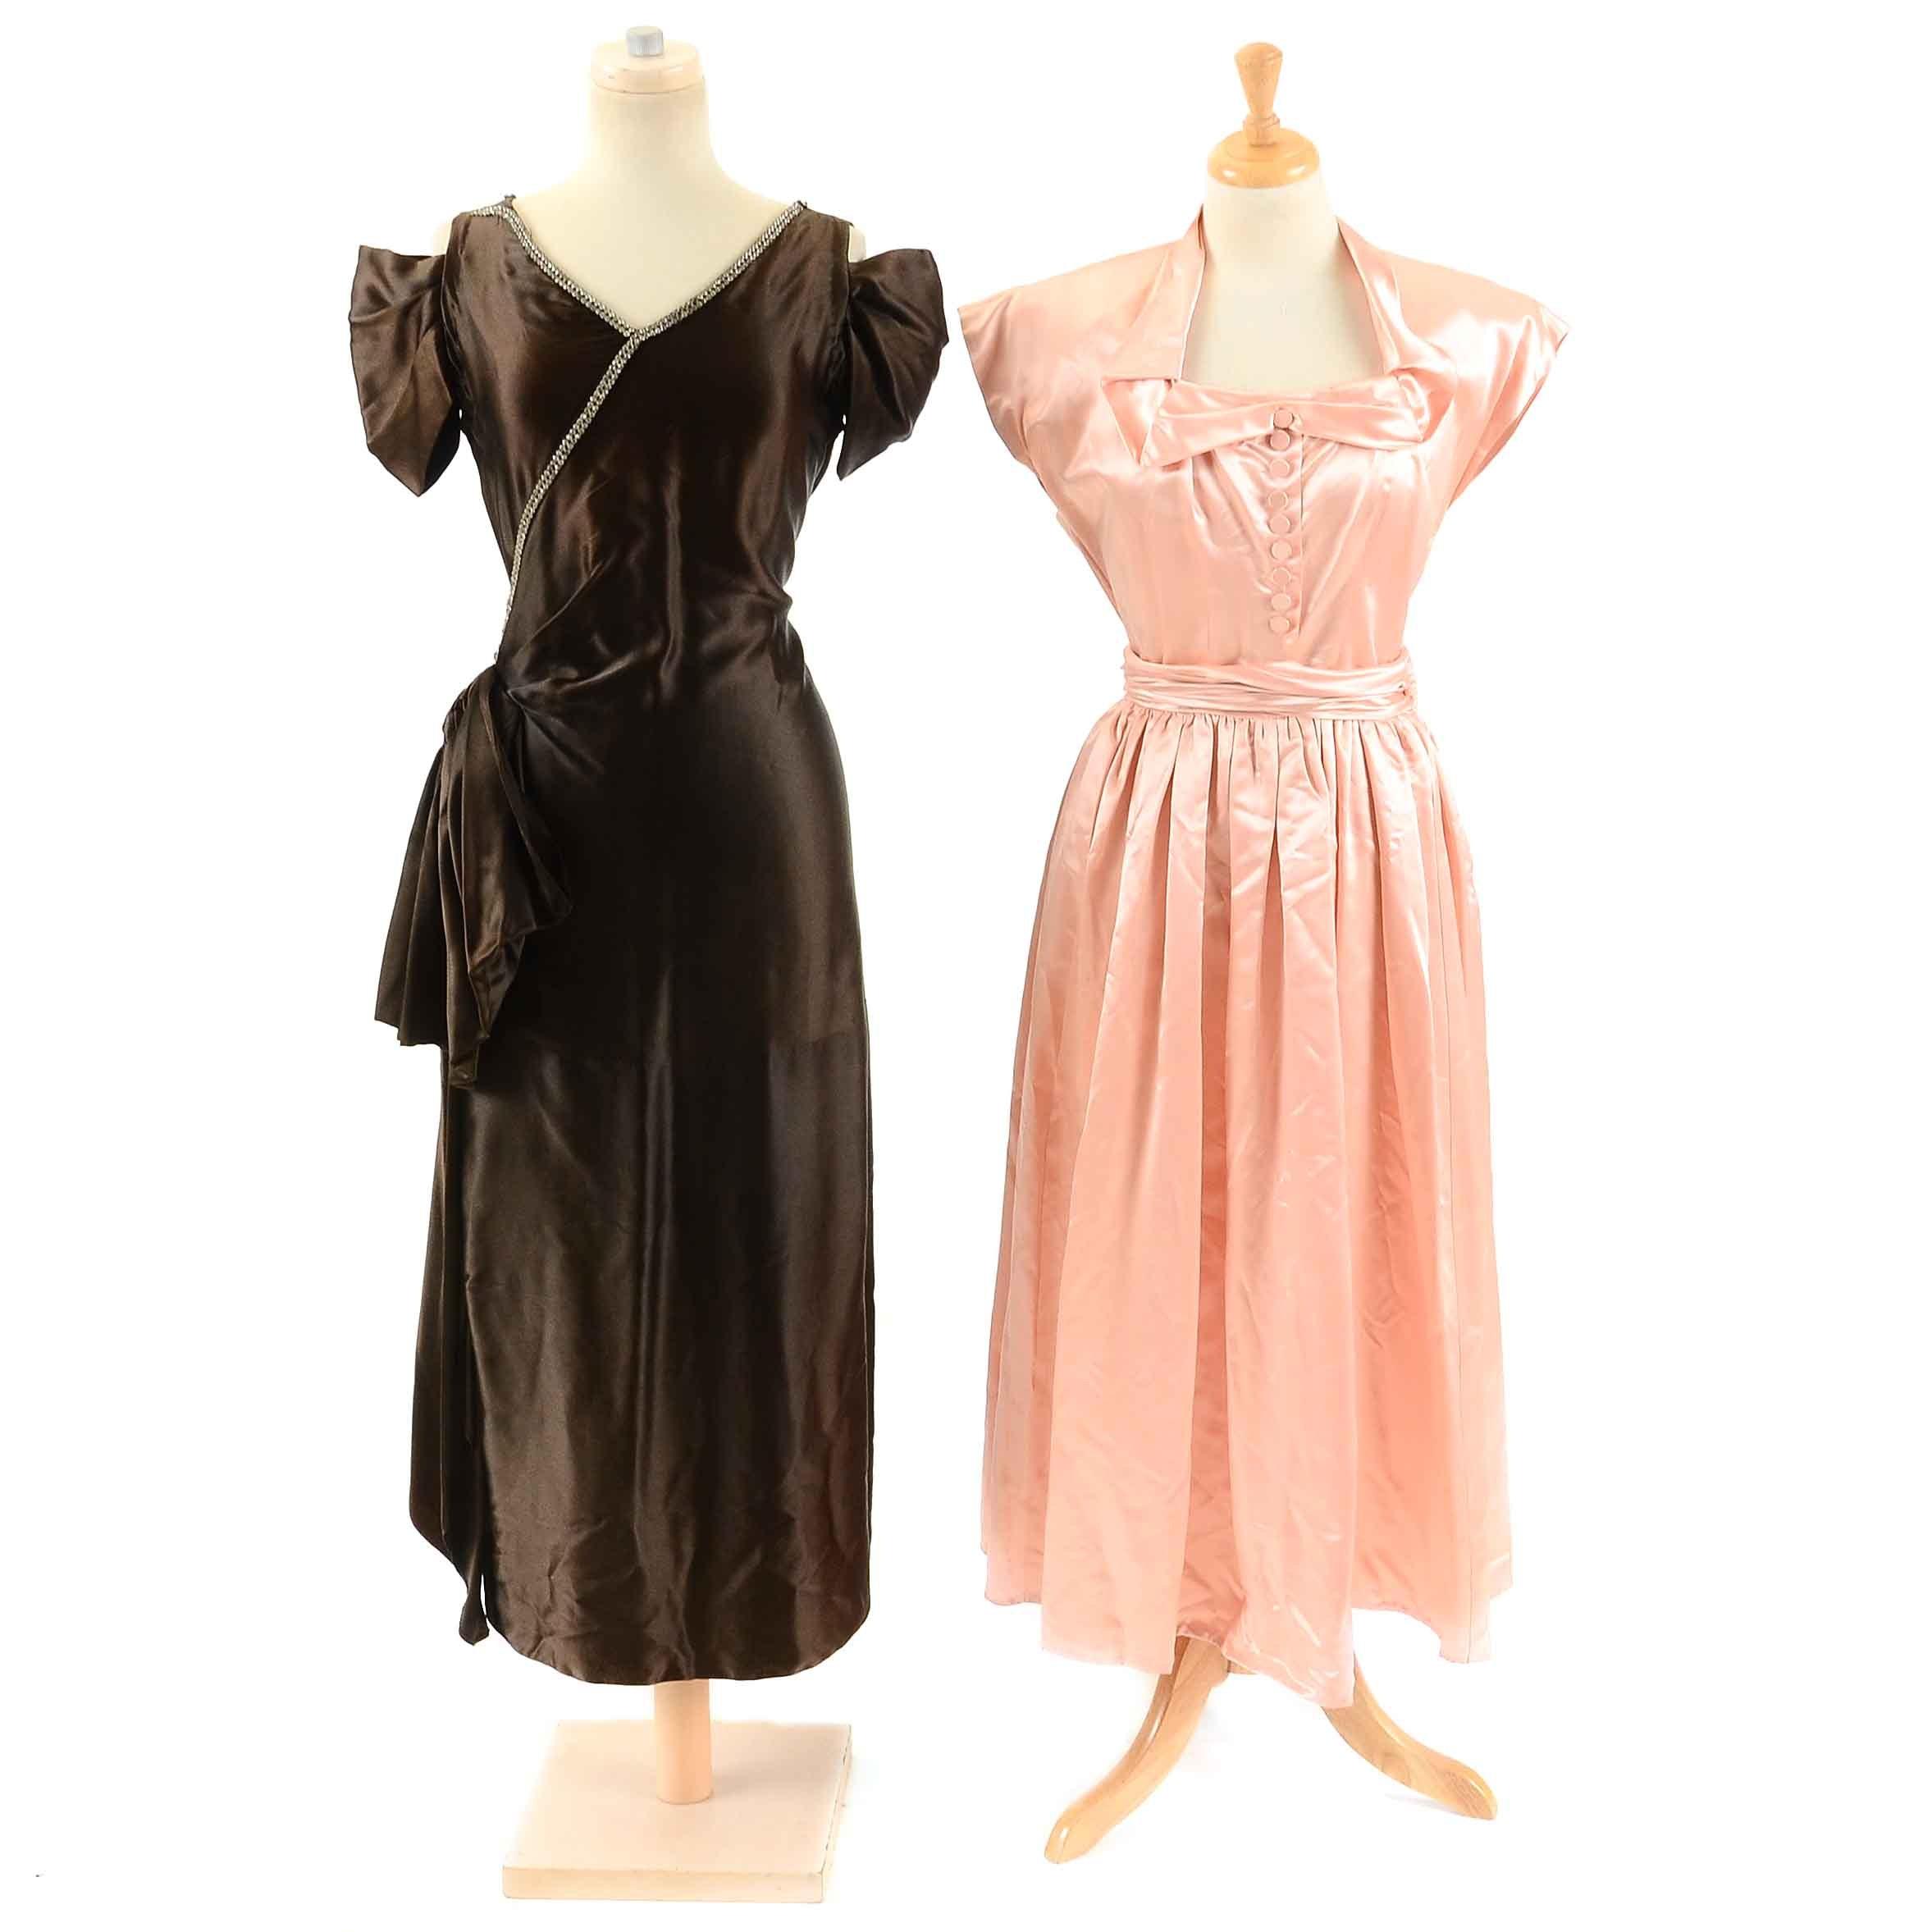 Women's 1950s Evening Dresses